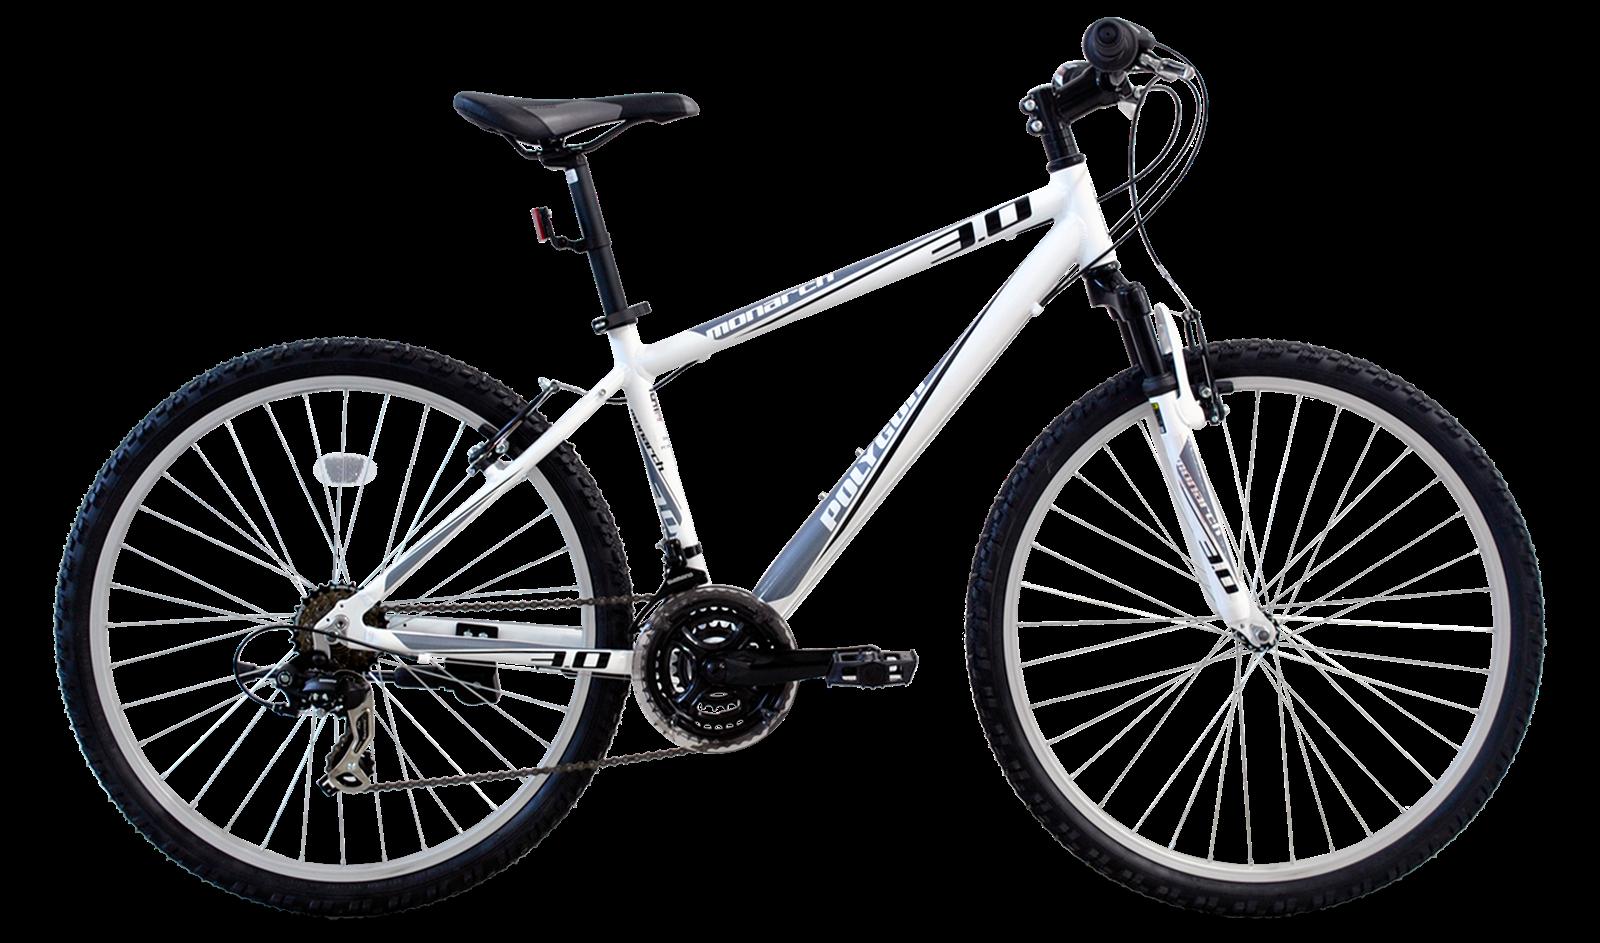 Fia Bike Sepeda Gunung Polygon Monarch 3 0 Gent Series